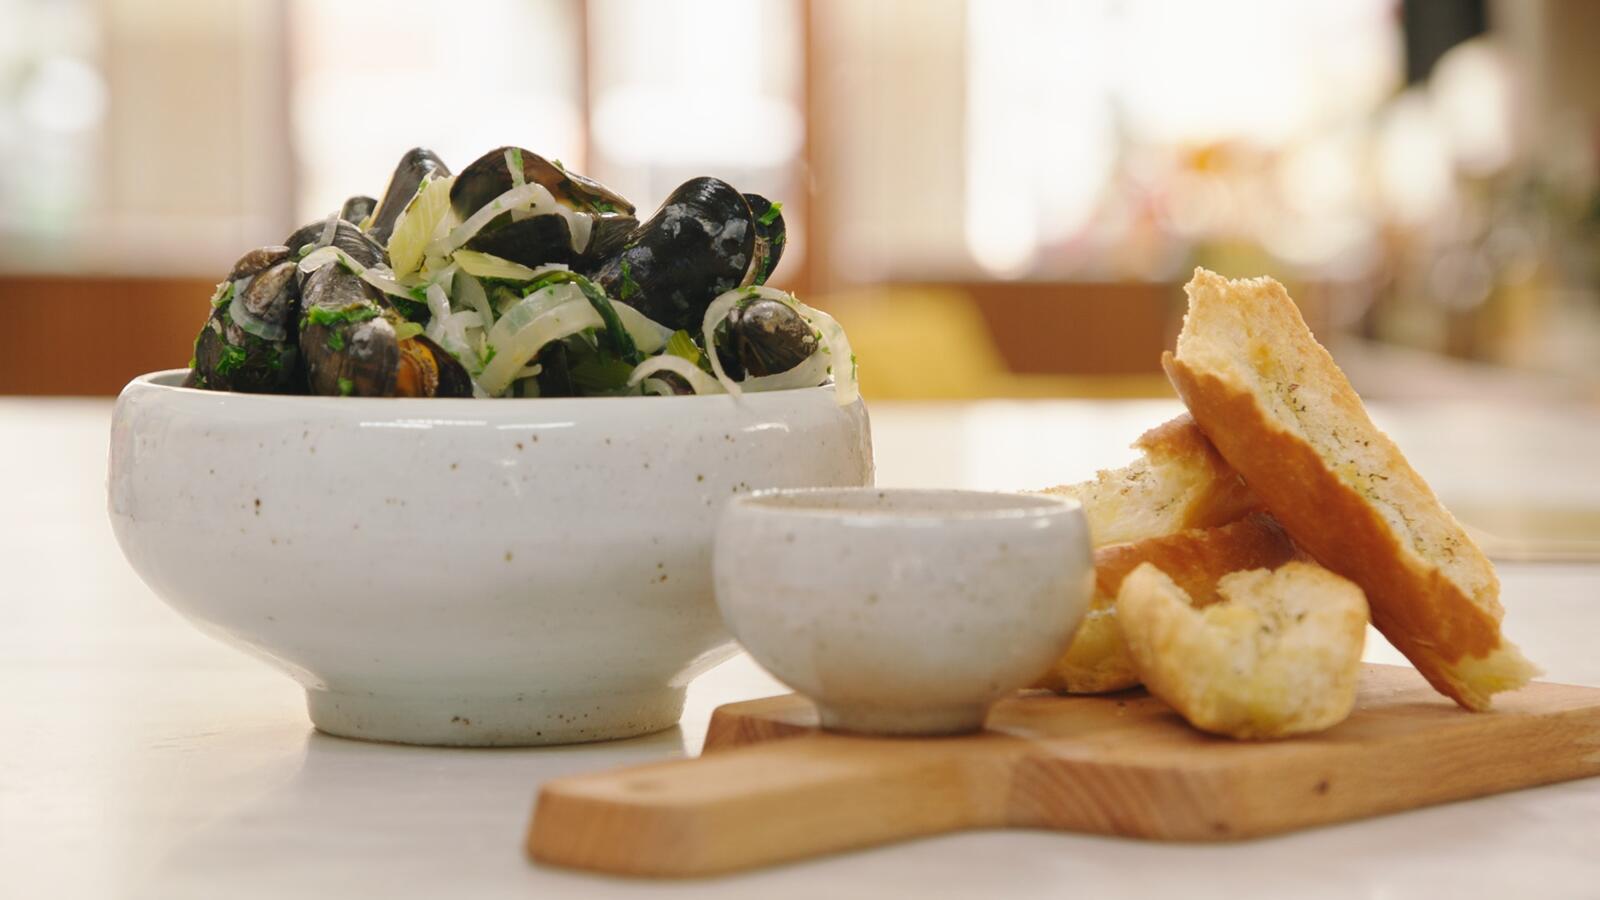 Mosselen met gremolata, mosselsaus en kruidenbroodjes